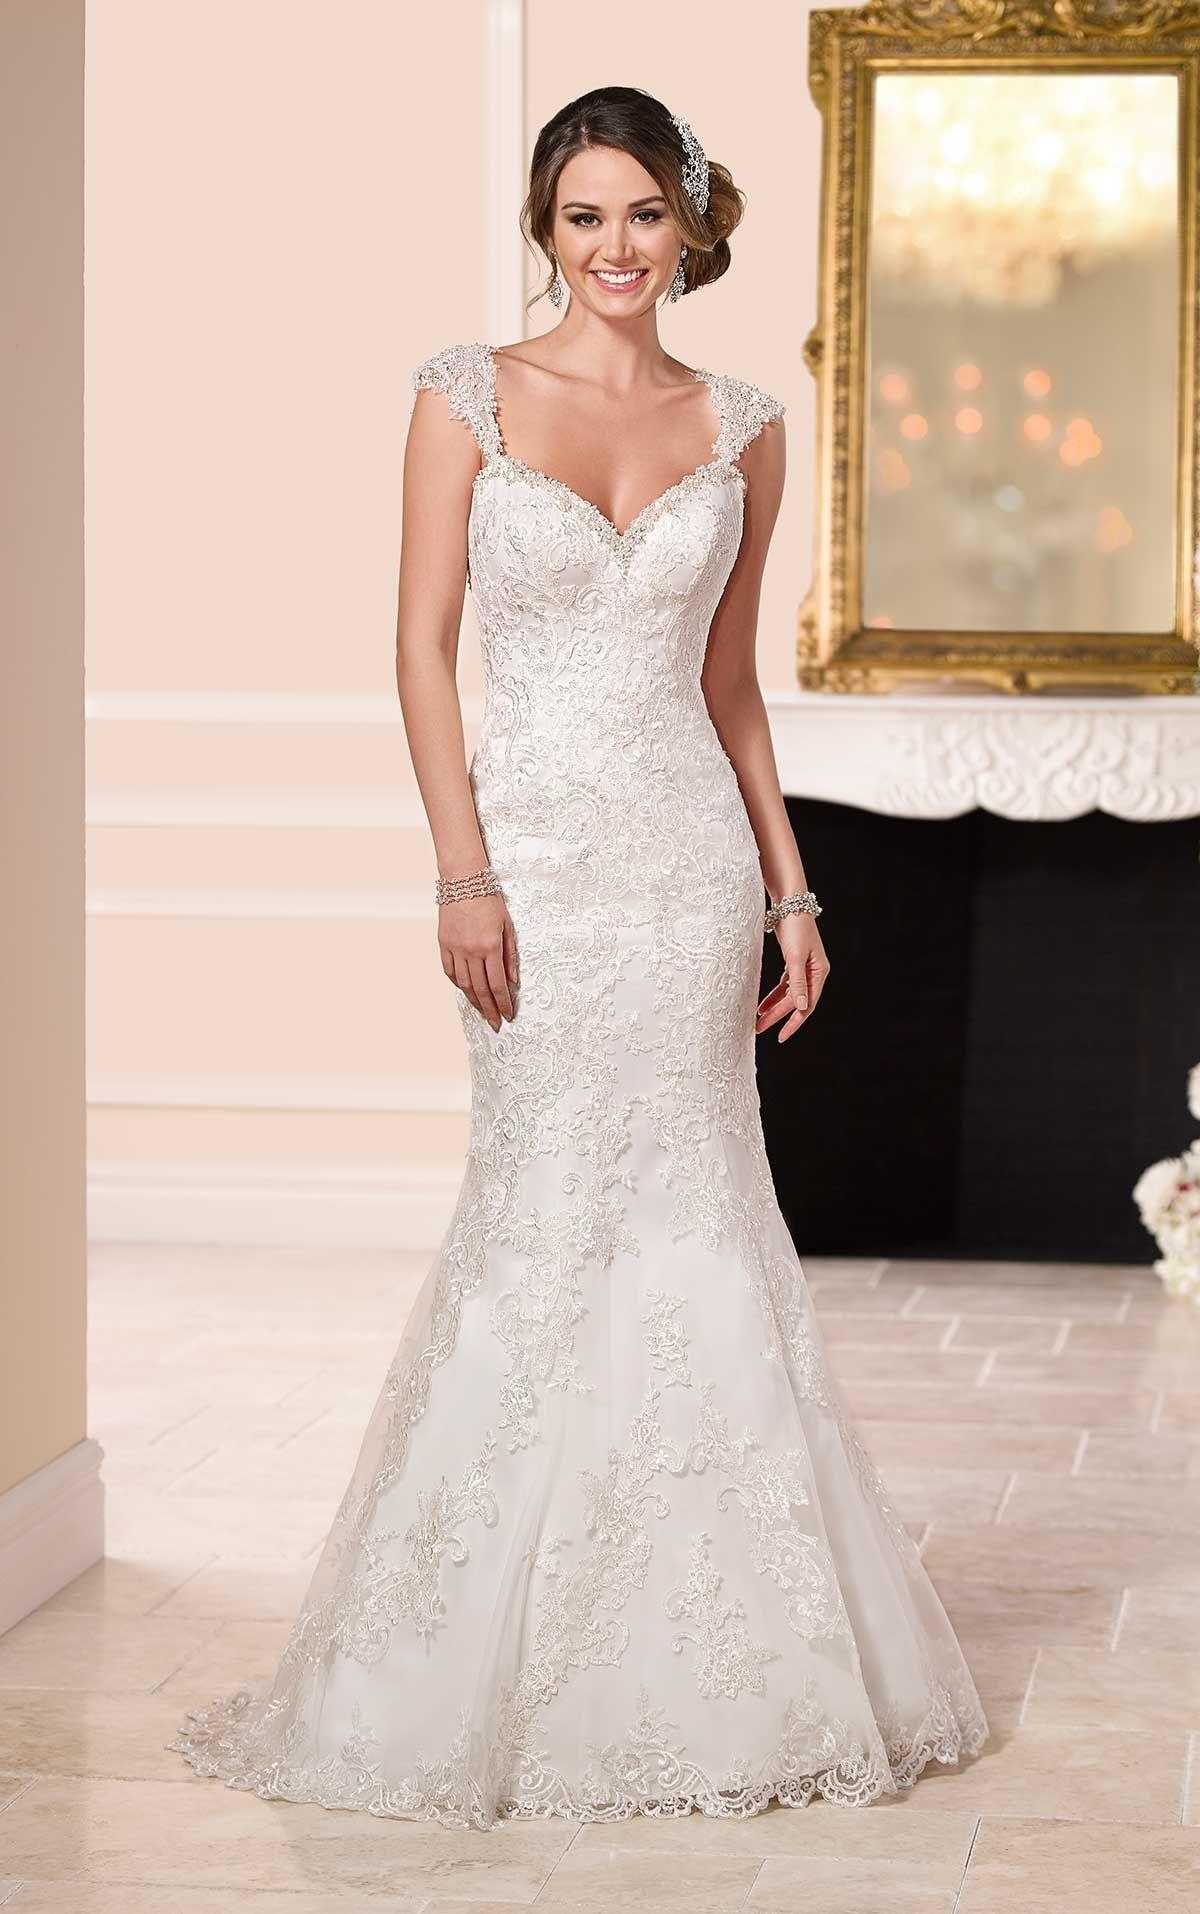 Vestido de noiva de stella york main zoom corte sereia